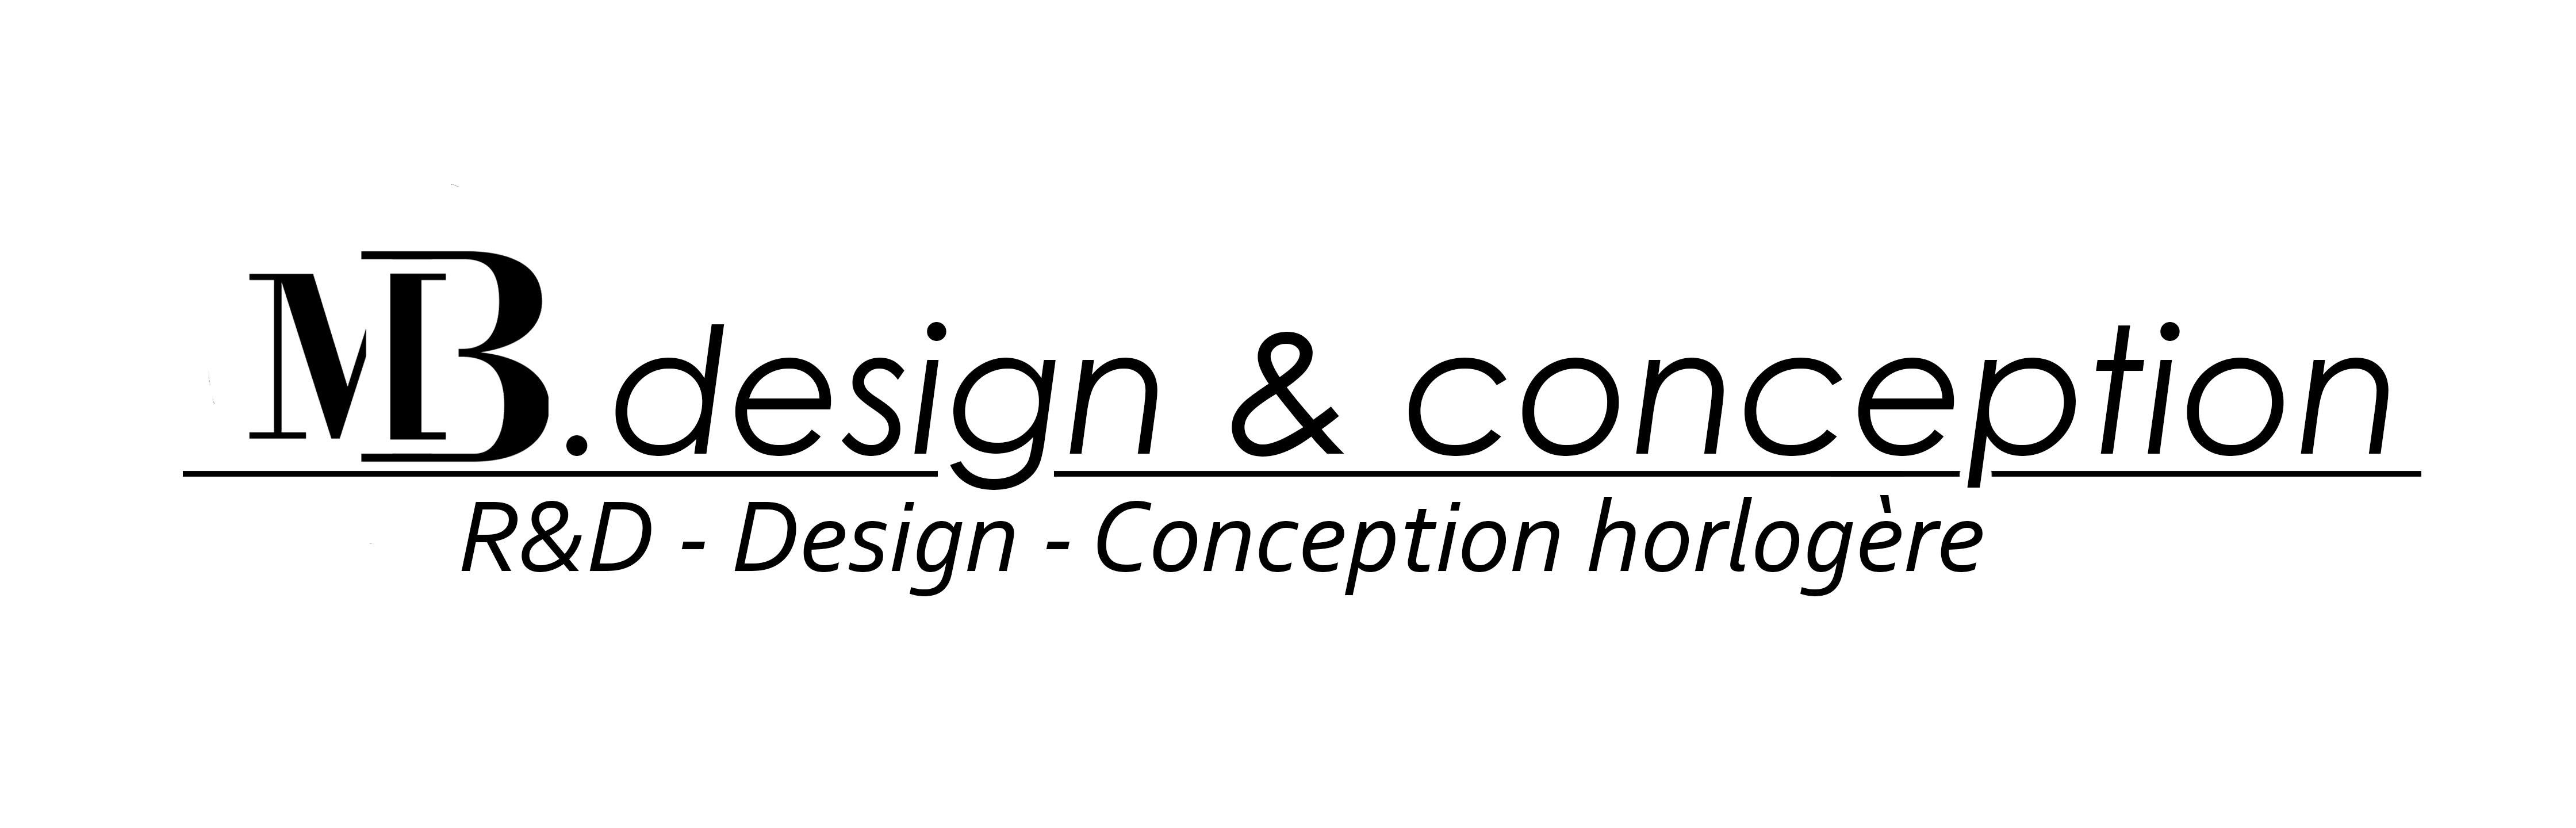 MB.Design&Conception